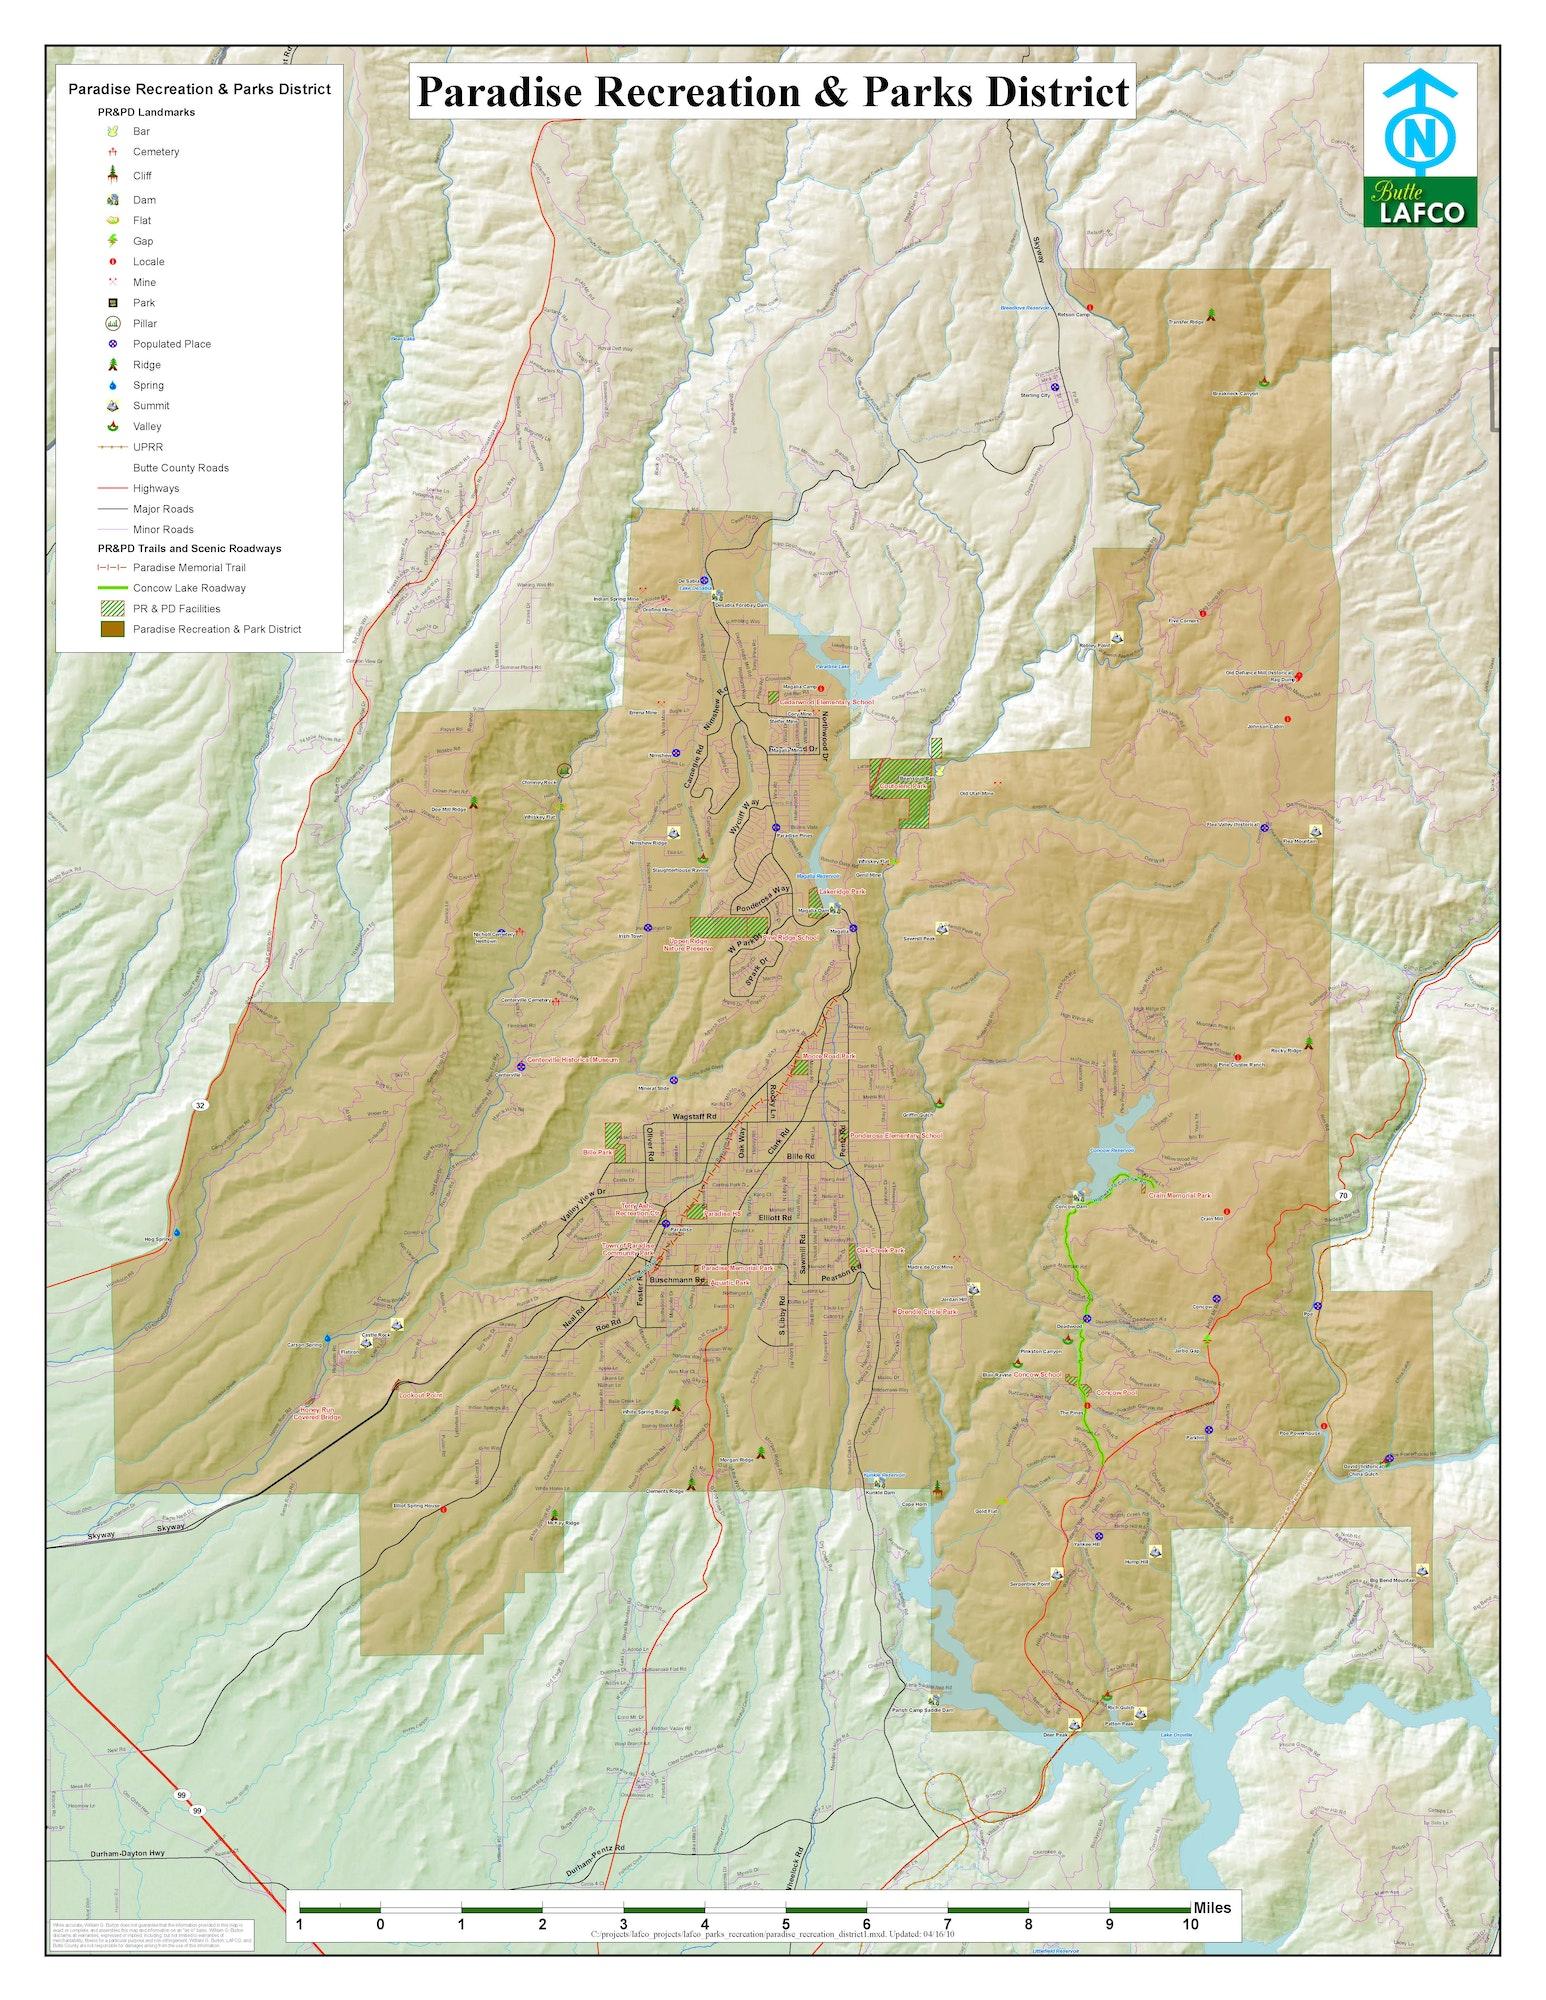 PRPD District Boundaries Map